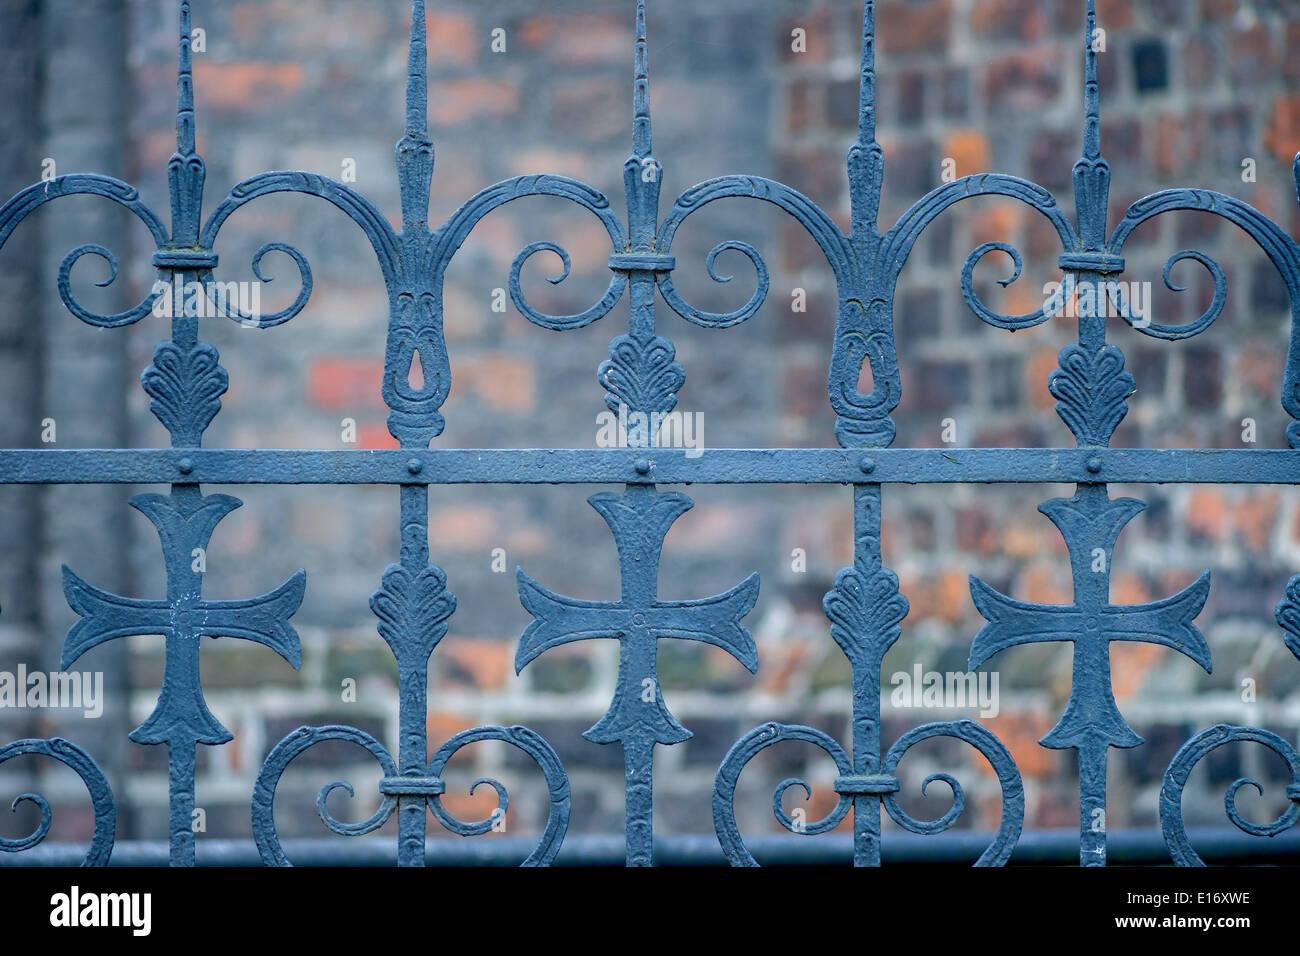 Old iron fence cross christian christianity - Stock Image